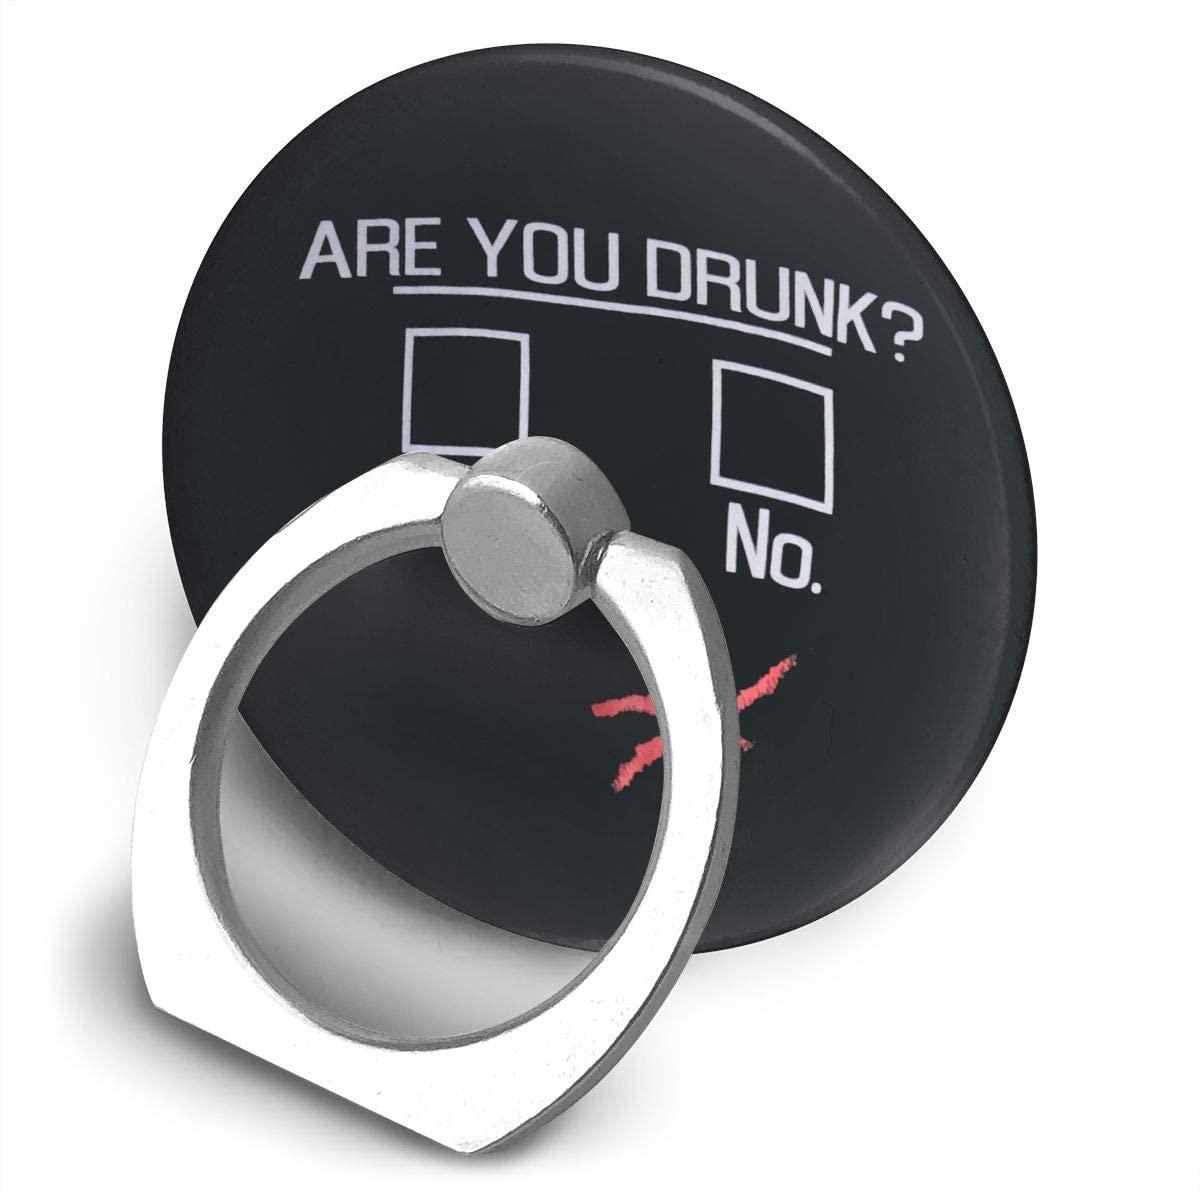 Yeorquae You Drun? Alloy Mobile Phone Ring Bracket,360 Degree Rotating Ring Stand Grip Mounts